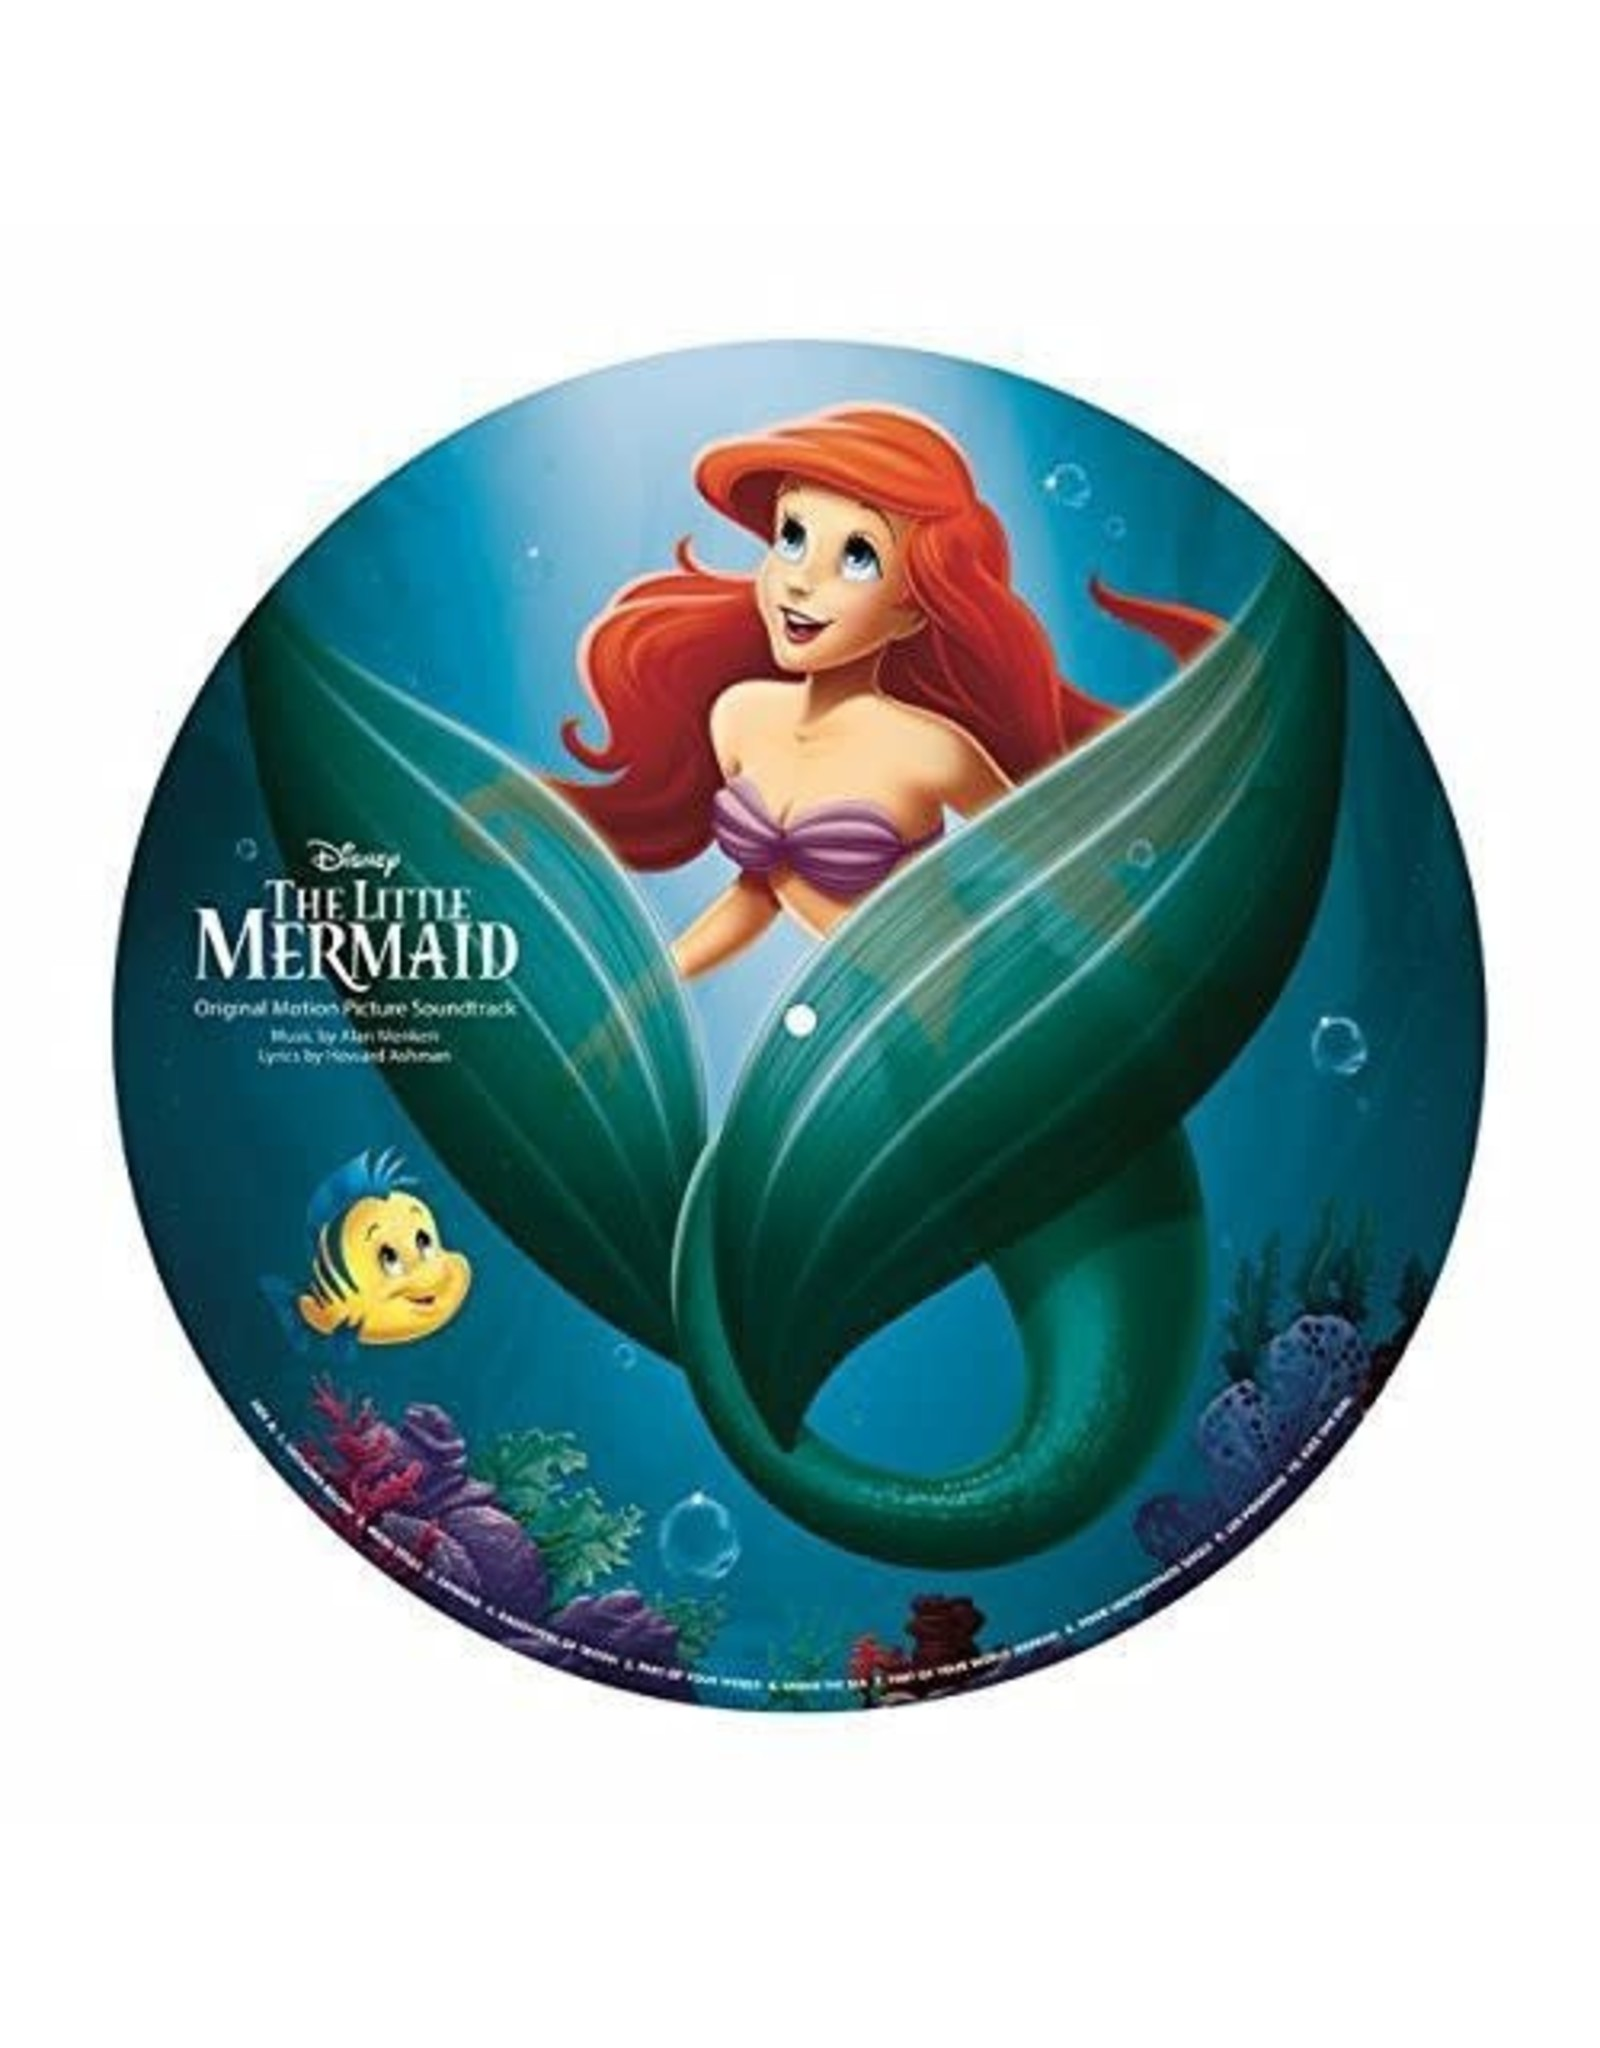 New Vinyl The Little Mermaid OST (Picture) LP